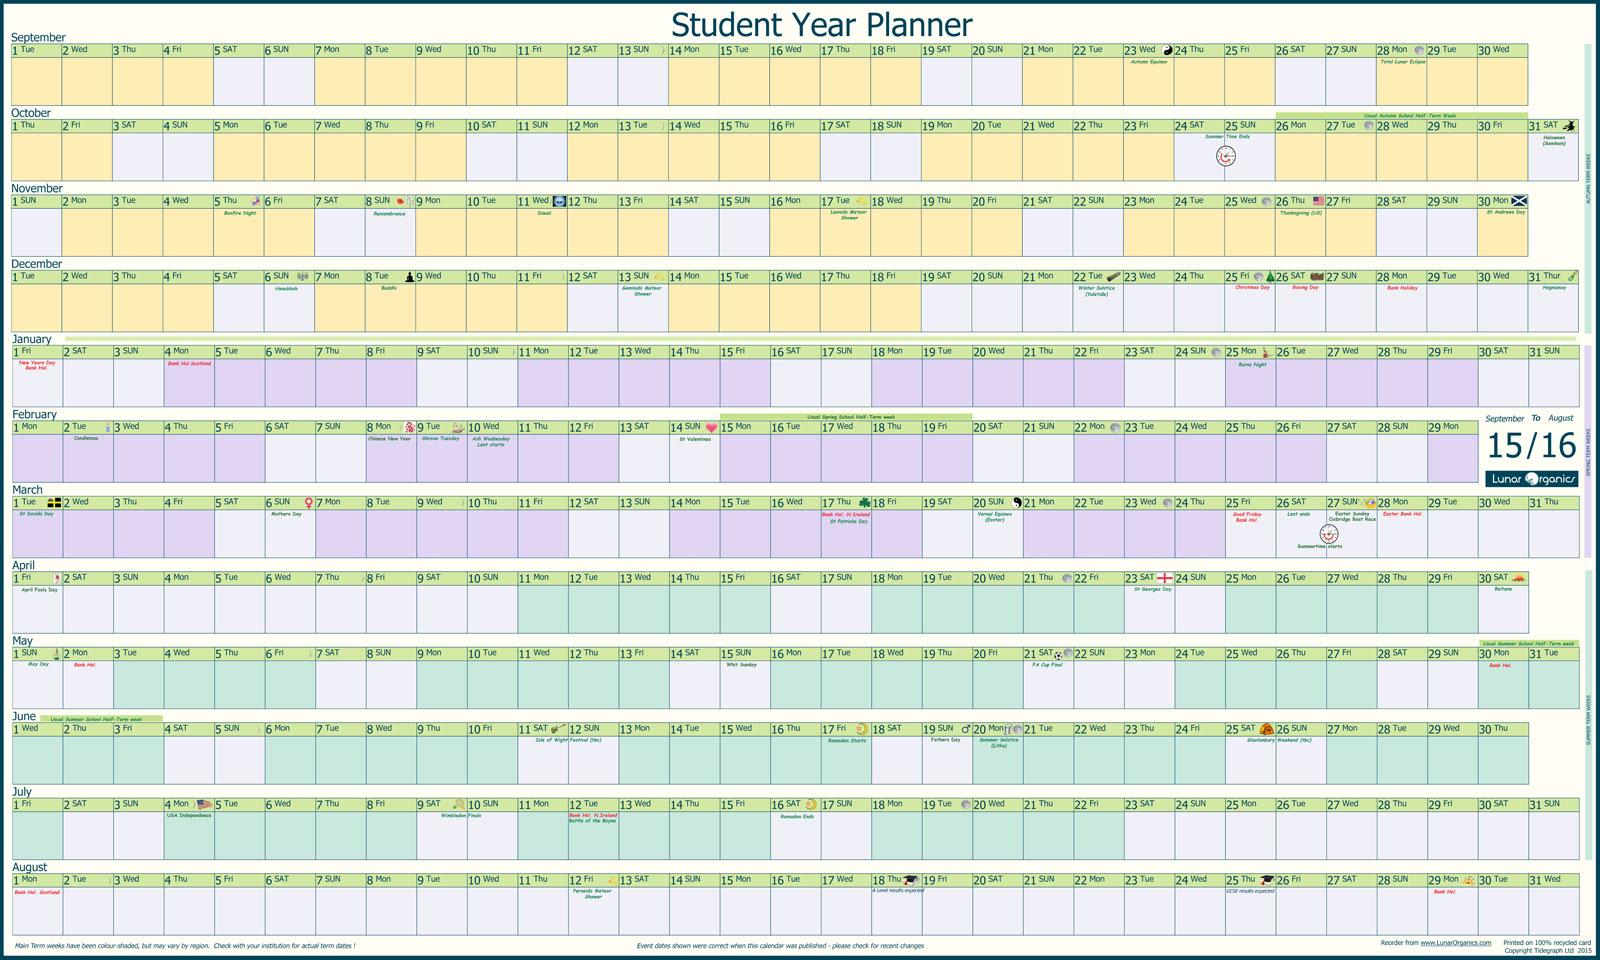 Calendar 2015 Year Planner 2015 Yearly Calendar 2015 Calendar 2015 ...